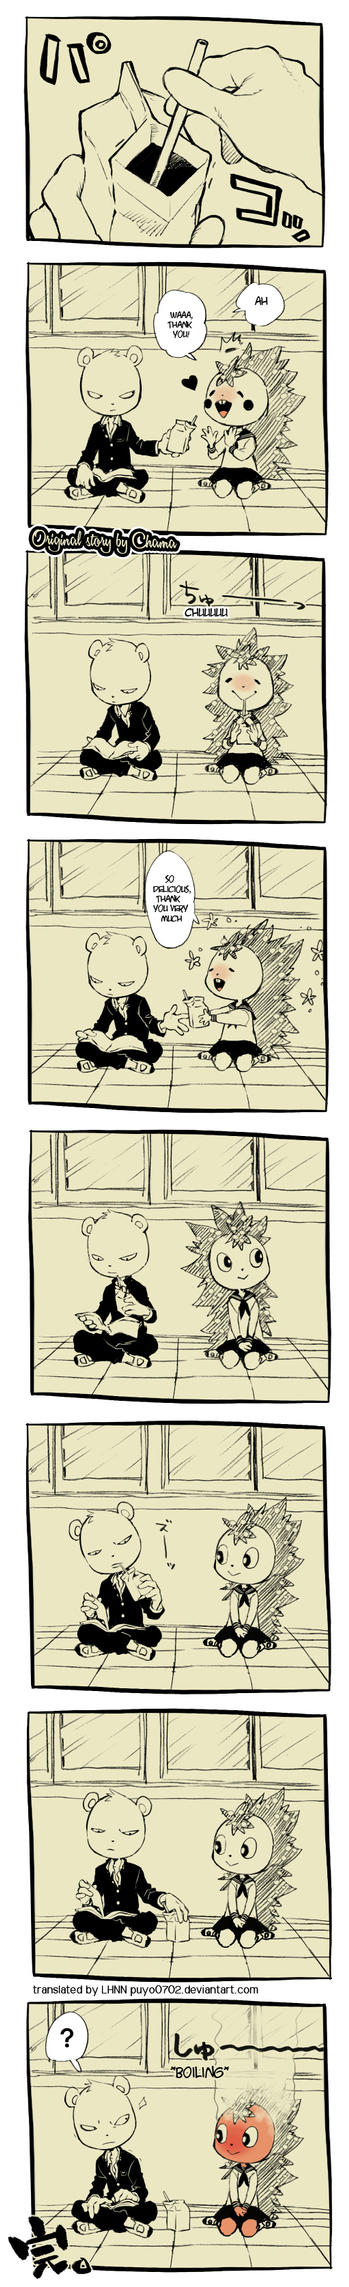 HTF doujinshi translation #6 by minglee7294